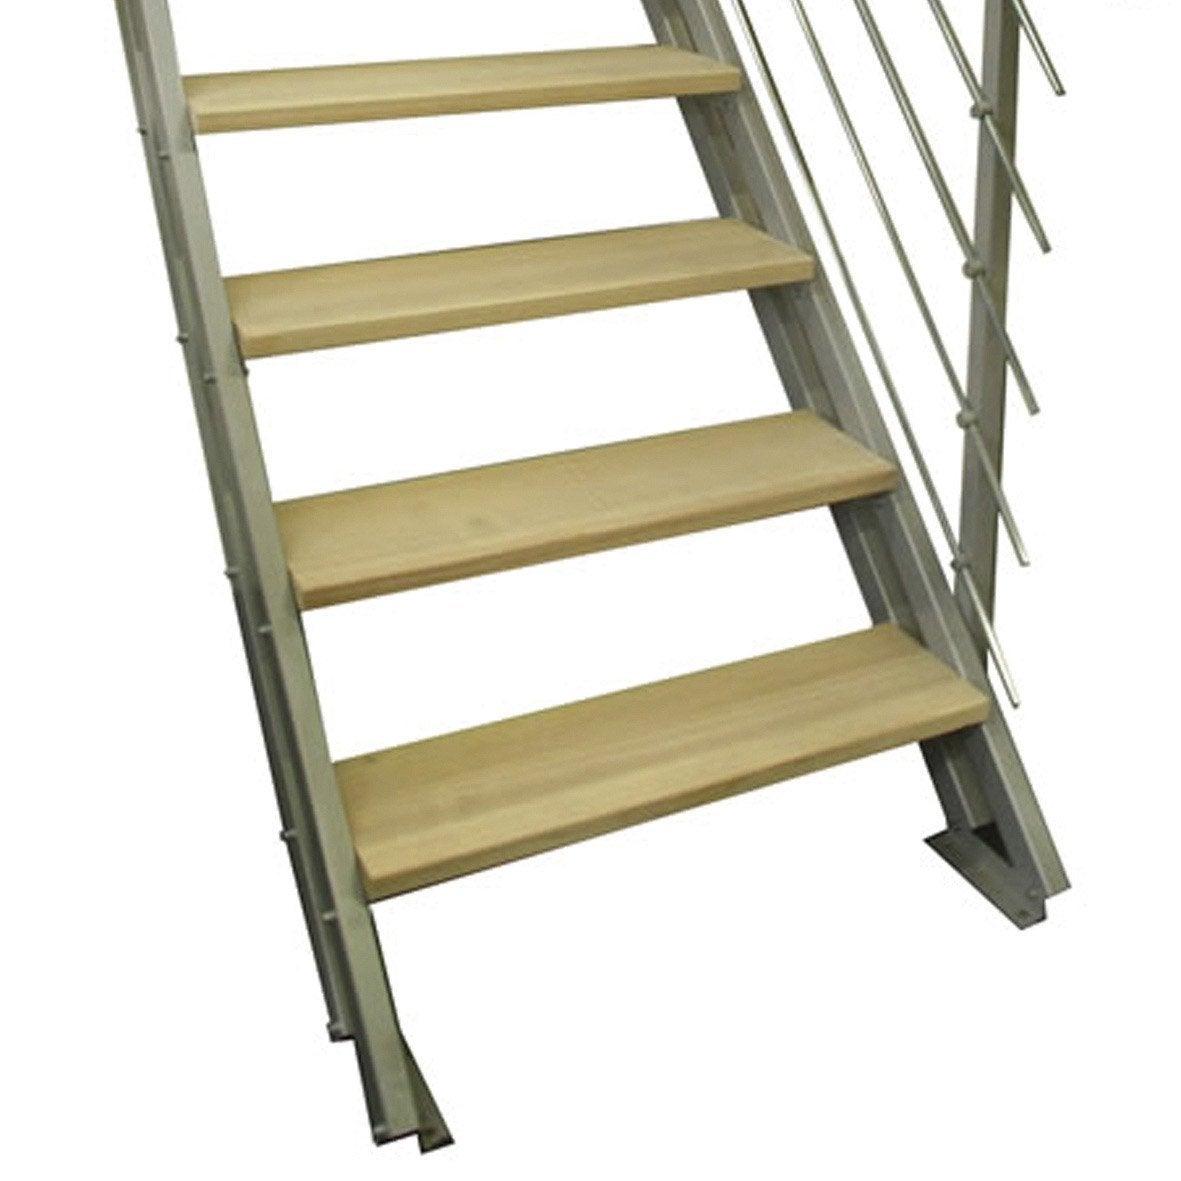 marche escalier exterieur gallery of comment scuriser luescalier extrieur with marche escalier. Black Bedroom Furniture Sets. Home Design Ideas